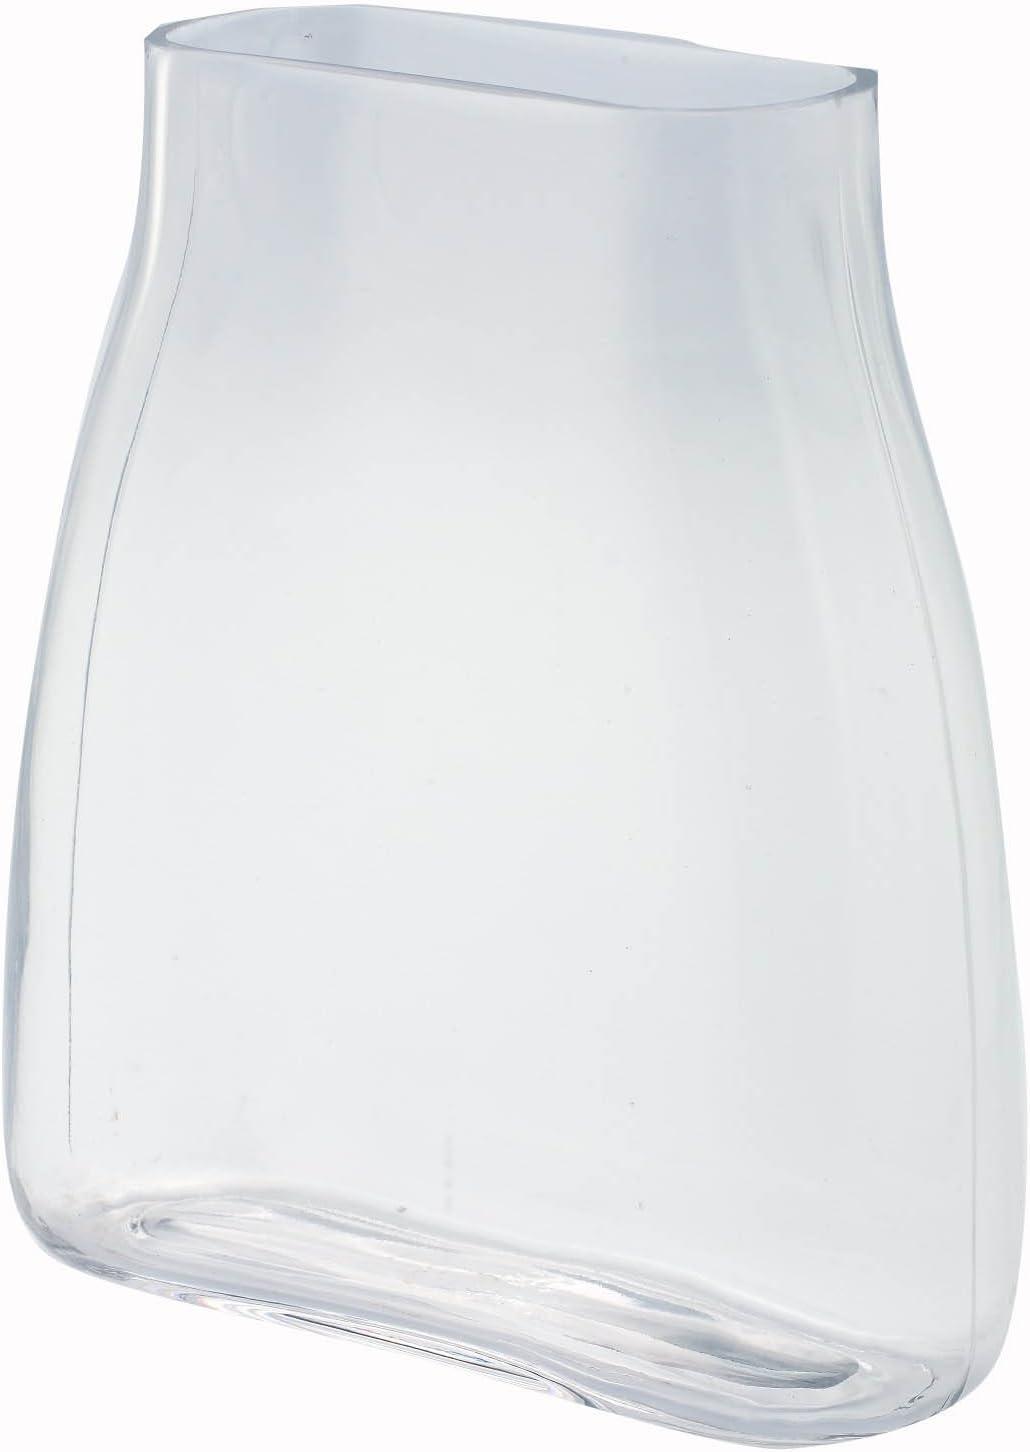 Amazon Com Diamond Star Glass 9 X3 5 X10 Clear Vase Home Kitchen